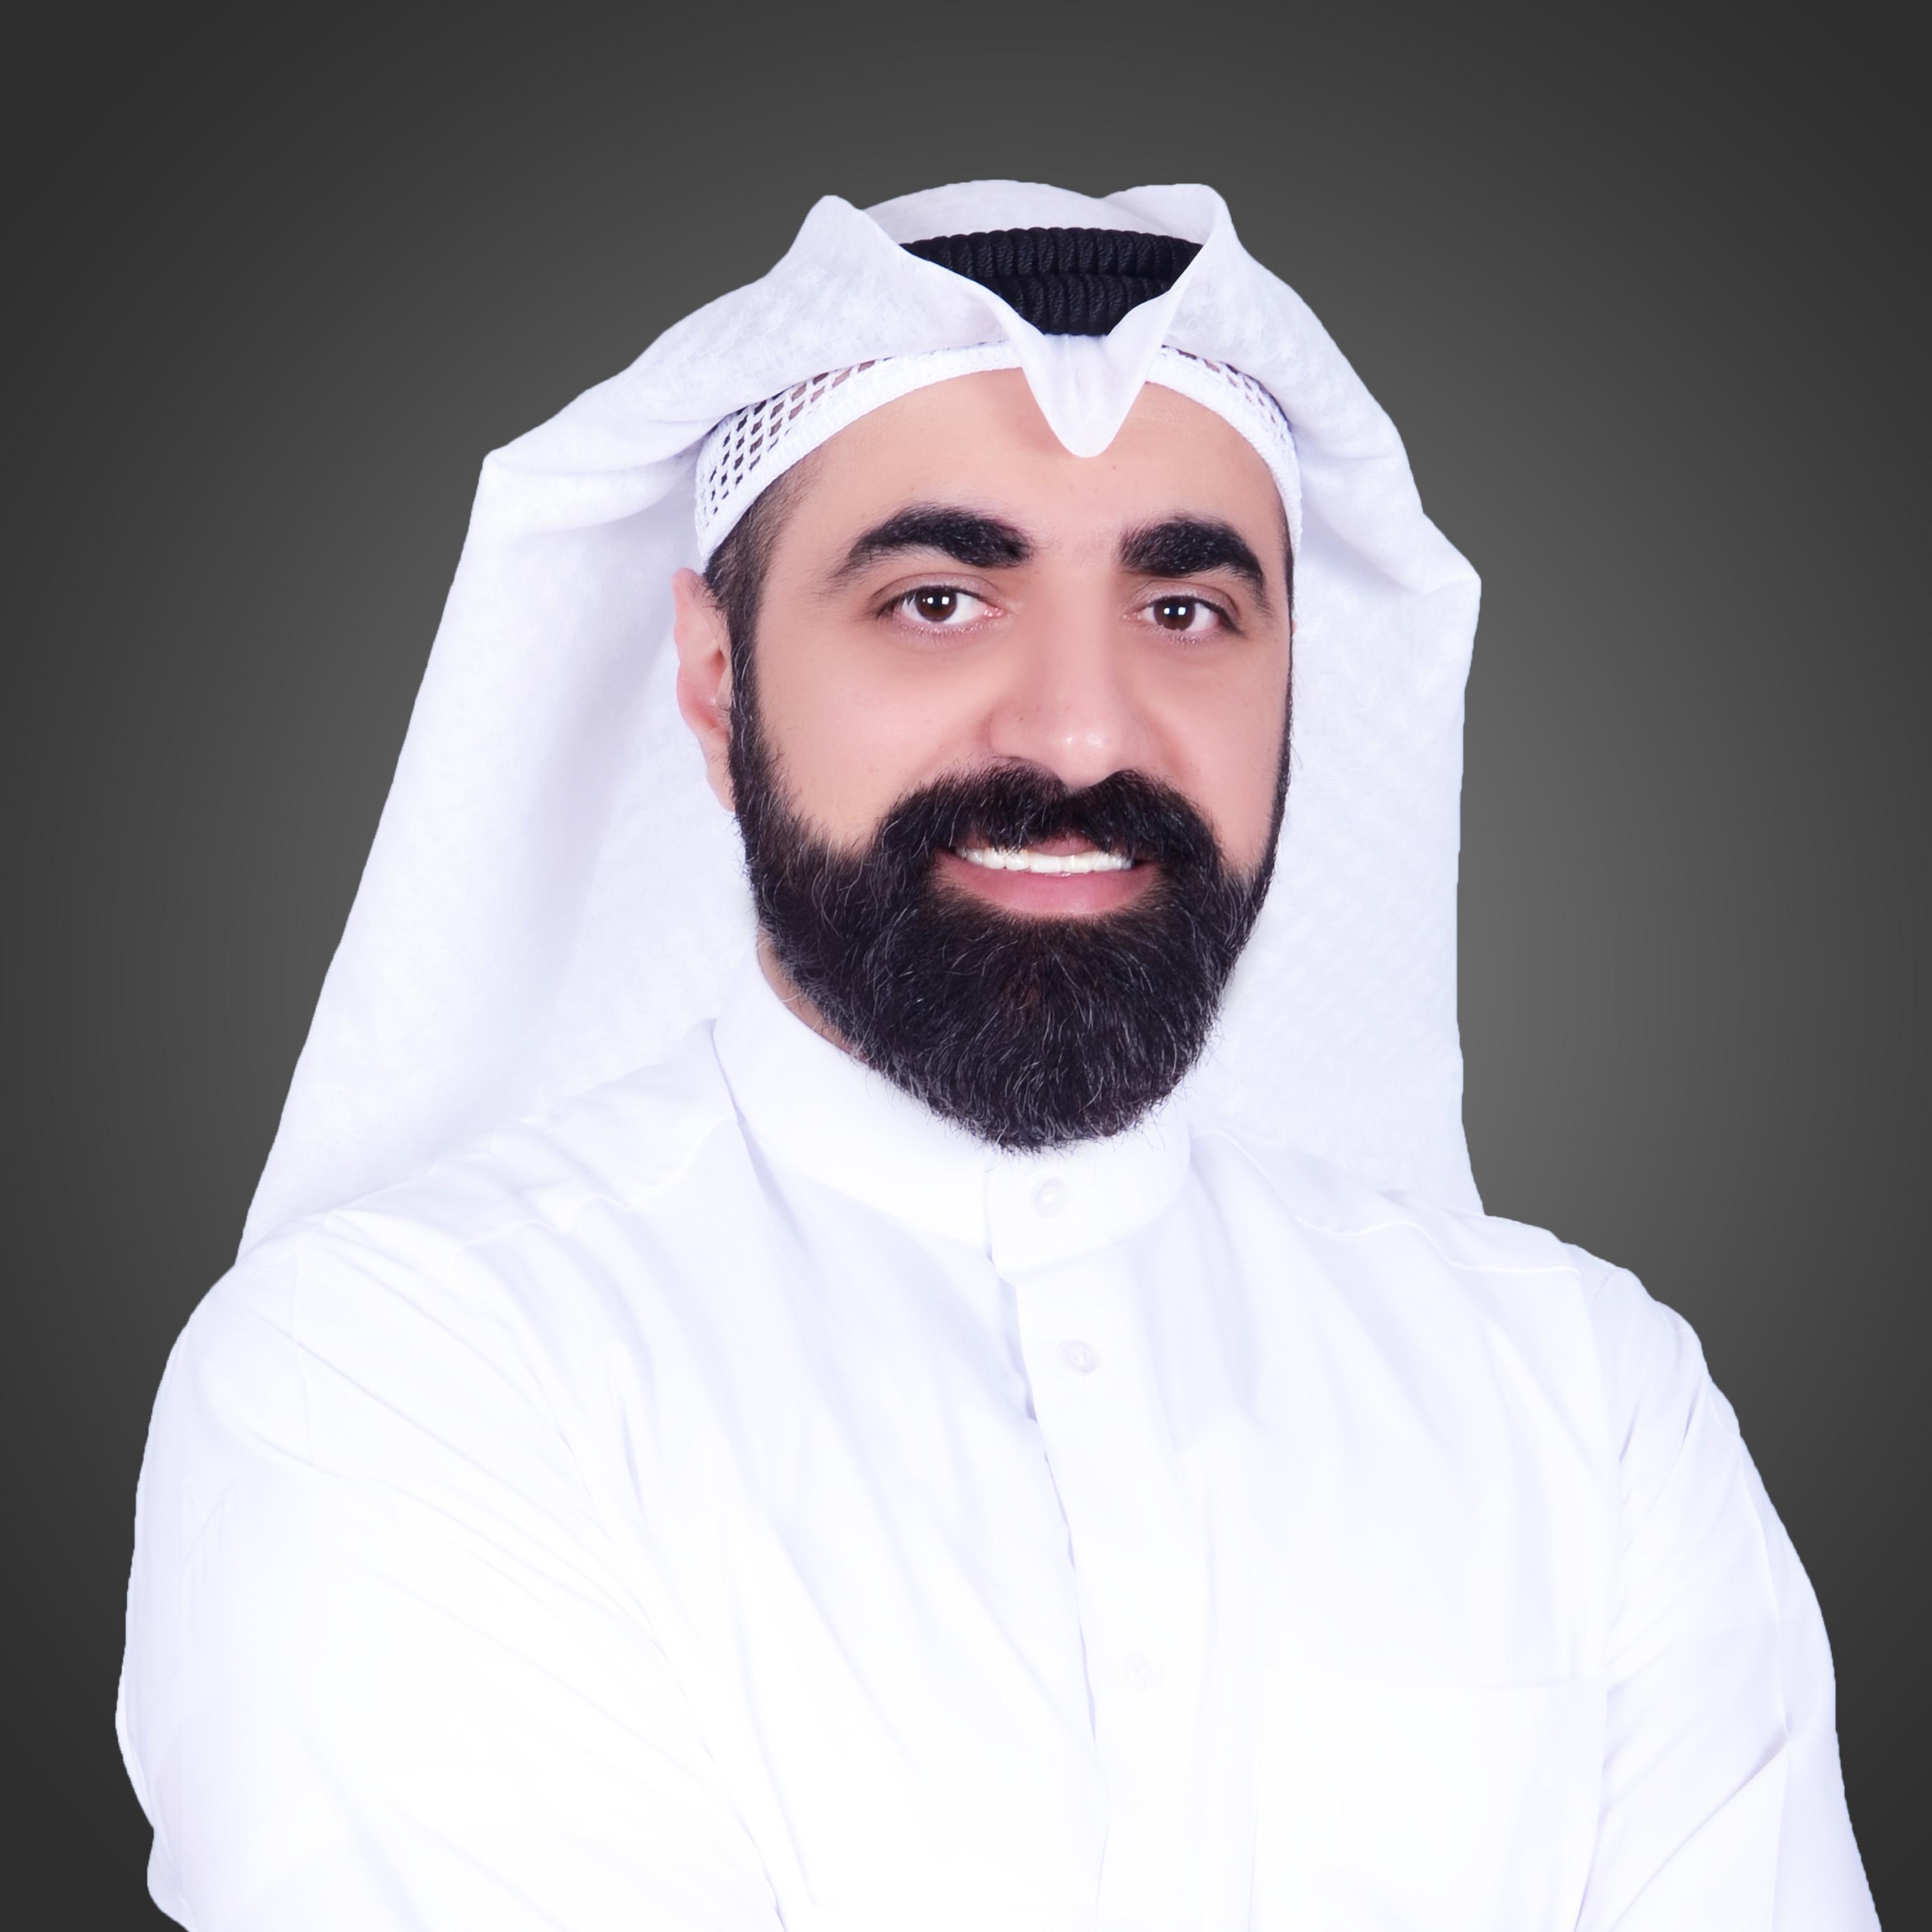 Ahmed Alawadhi